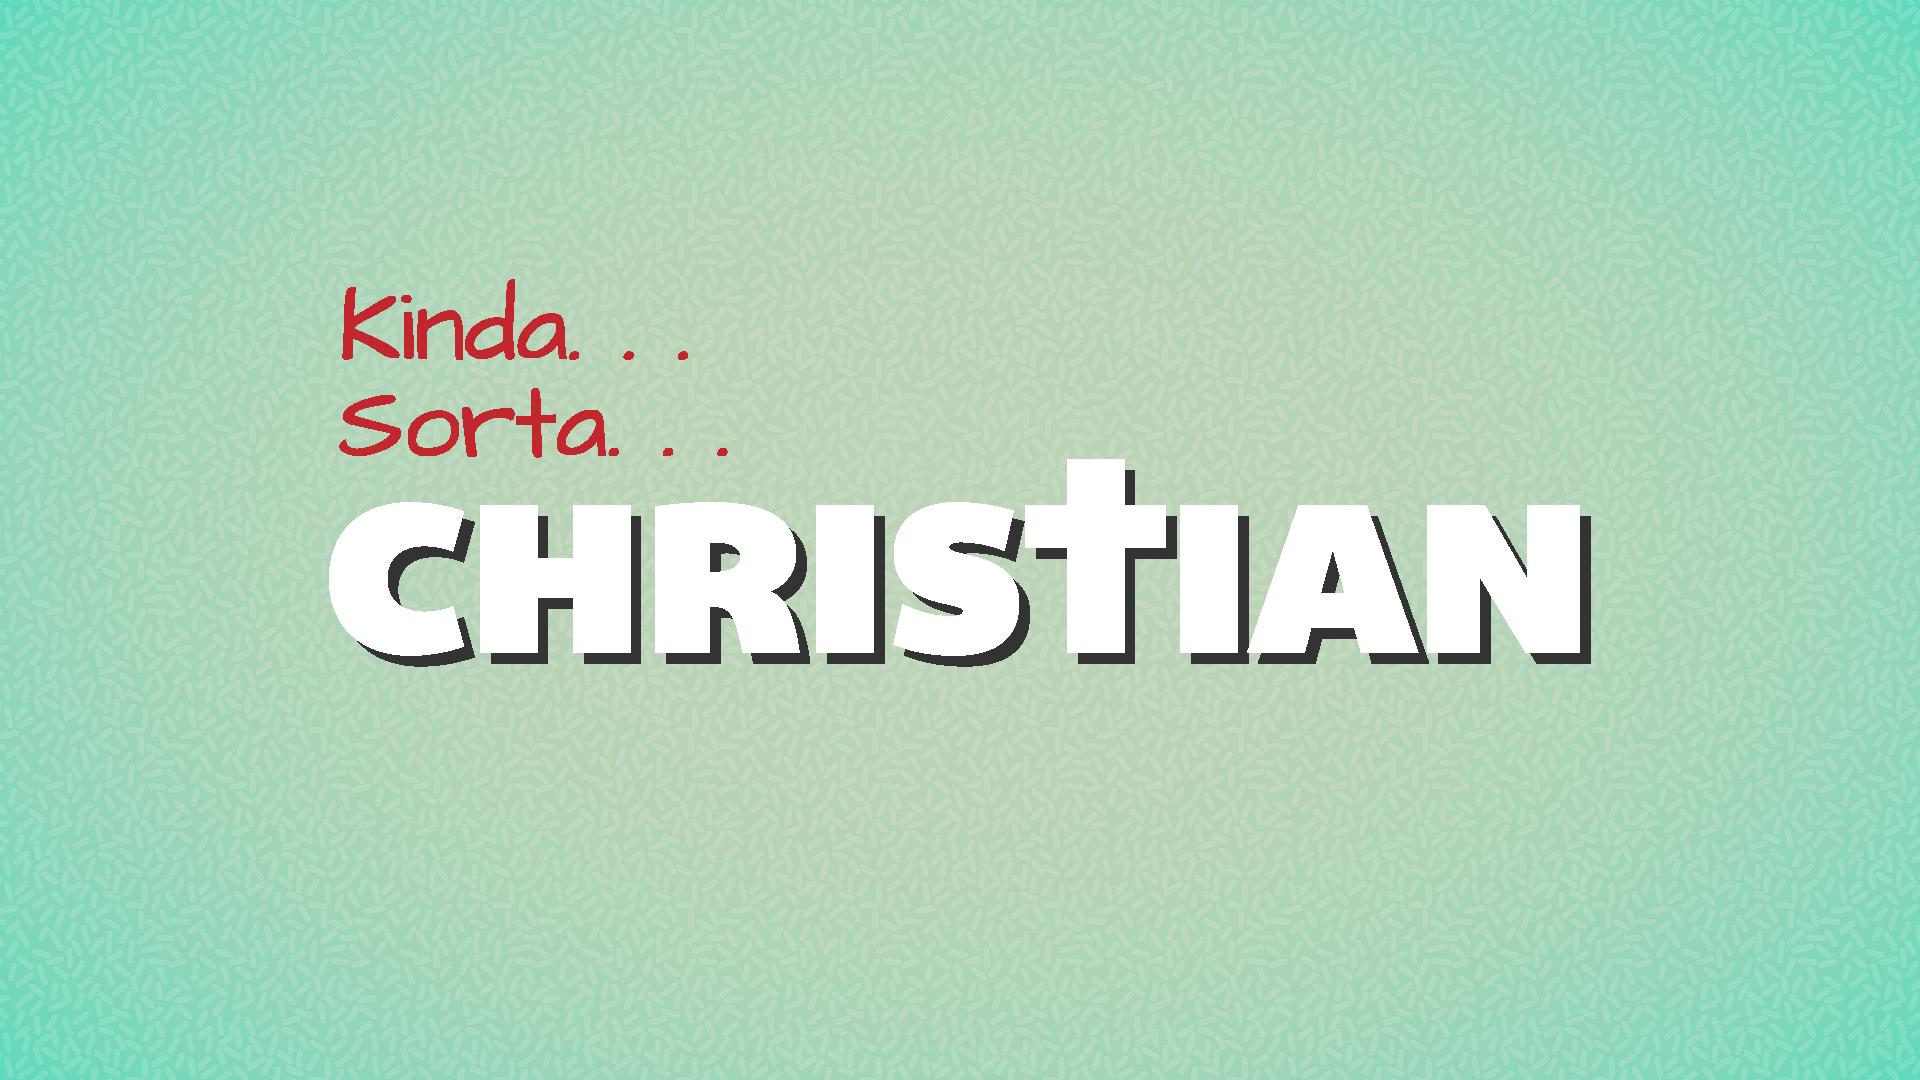 Kinda Sorta Christian